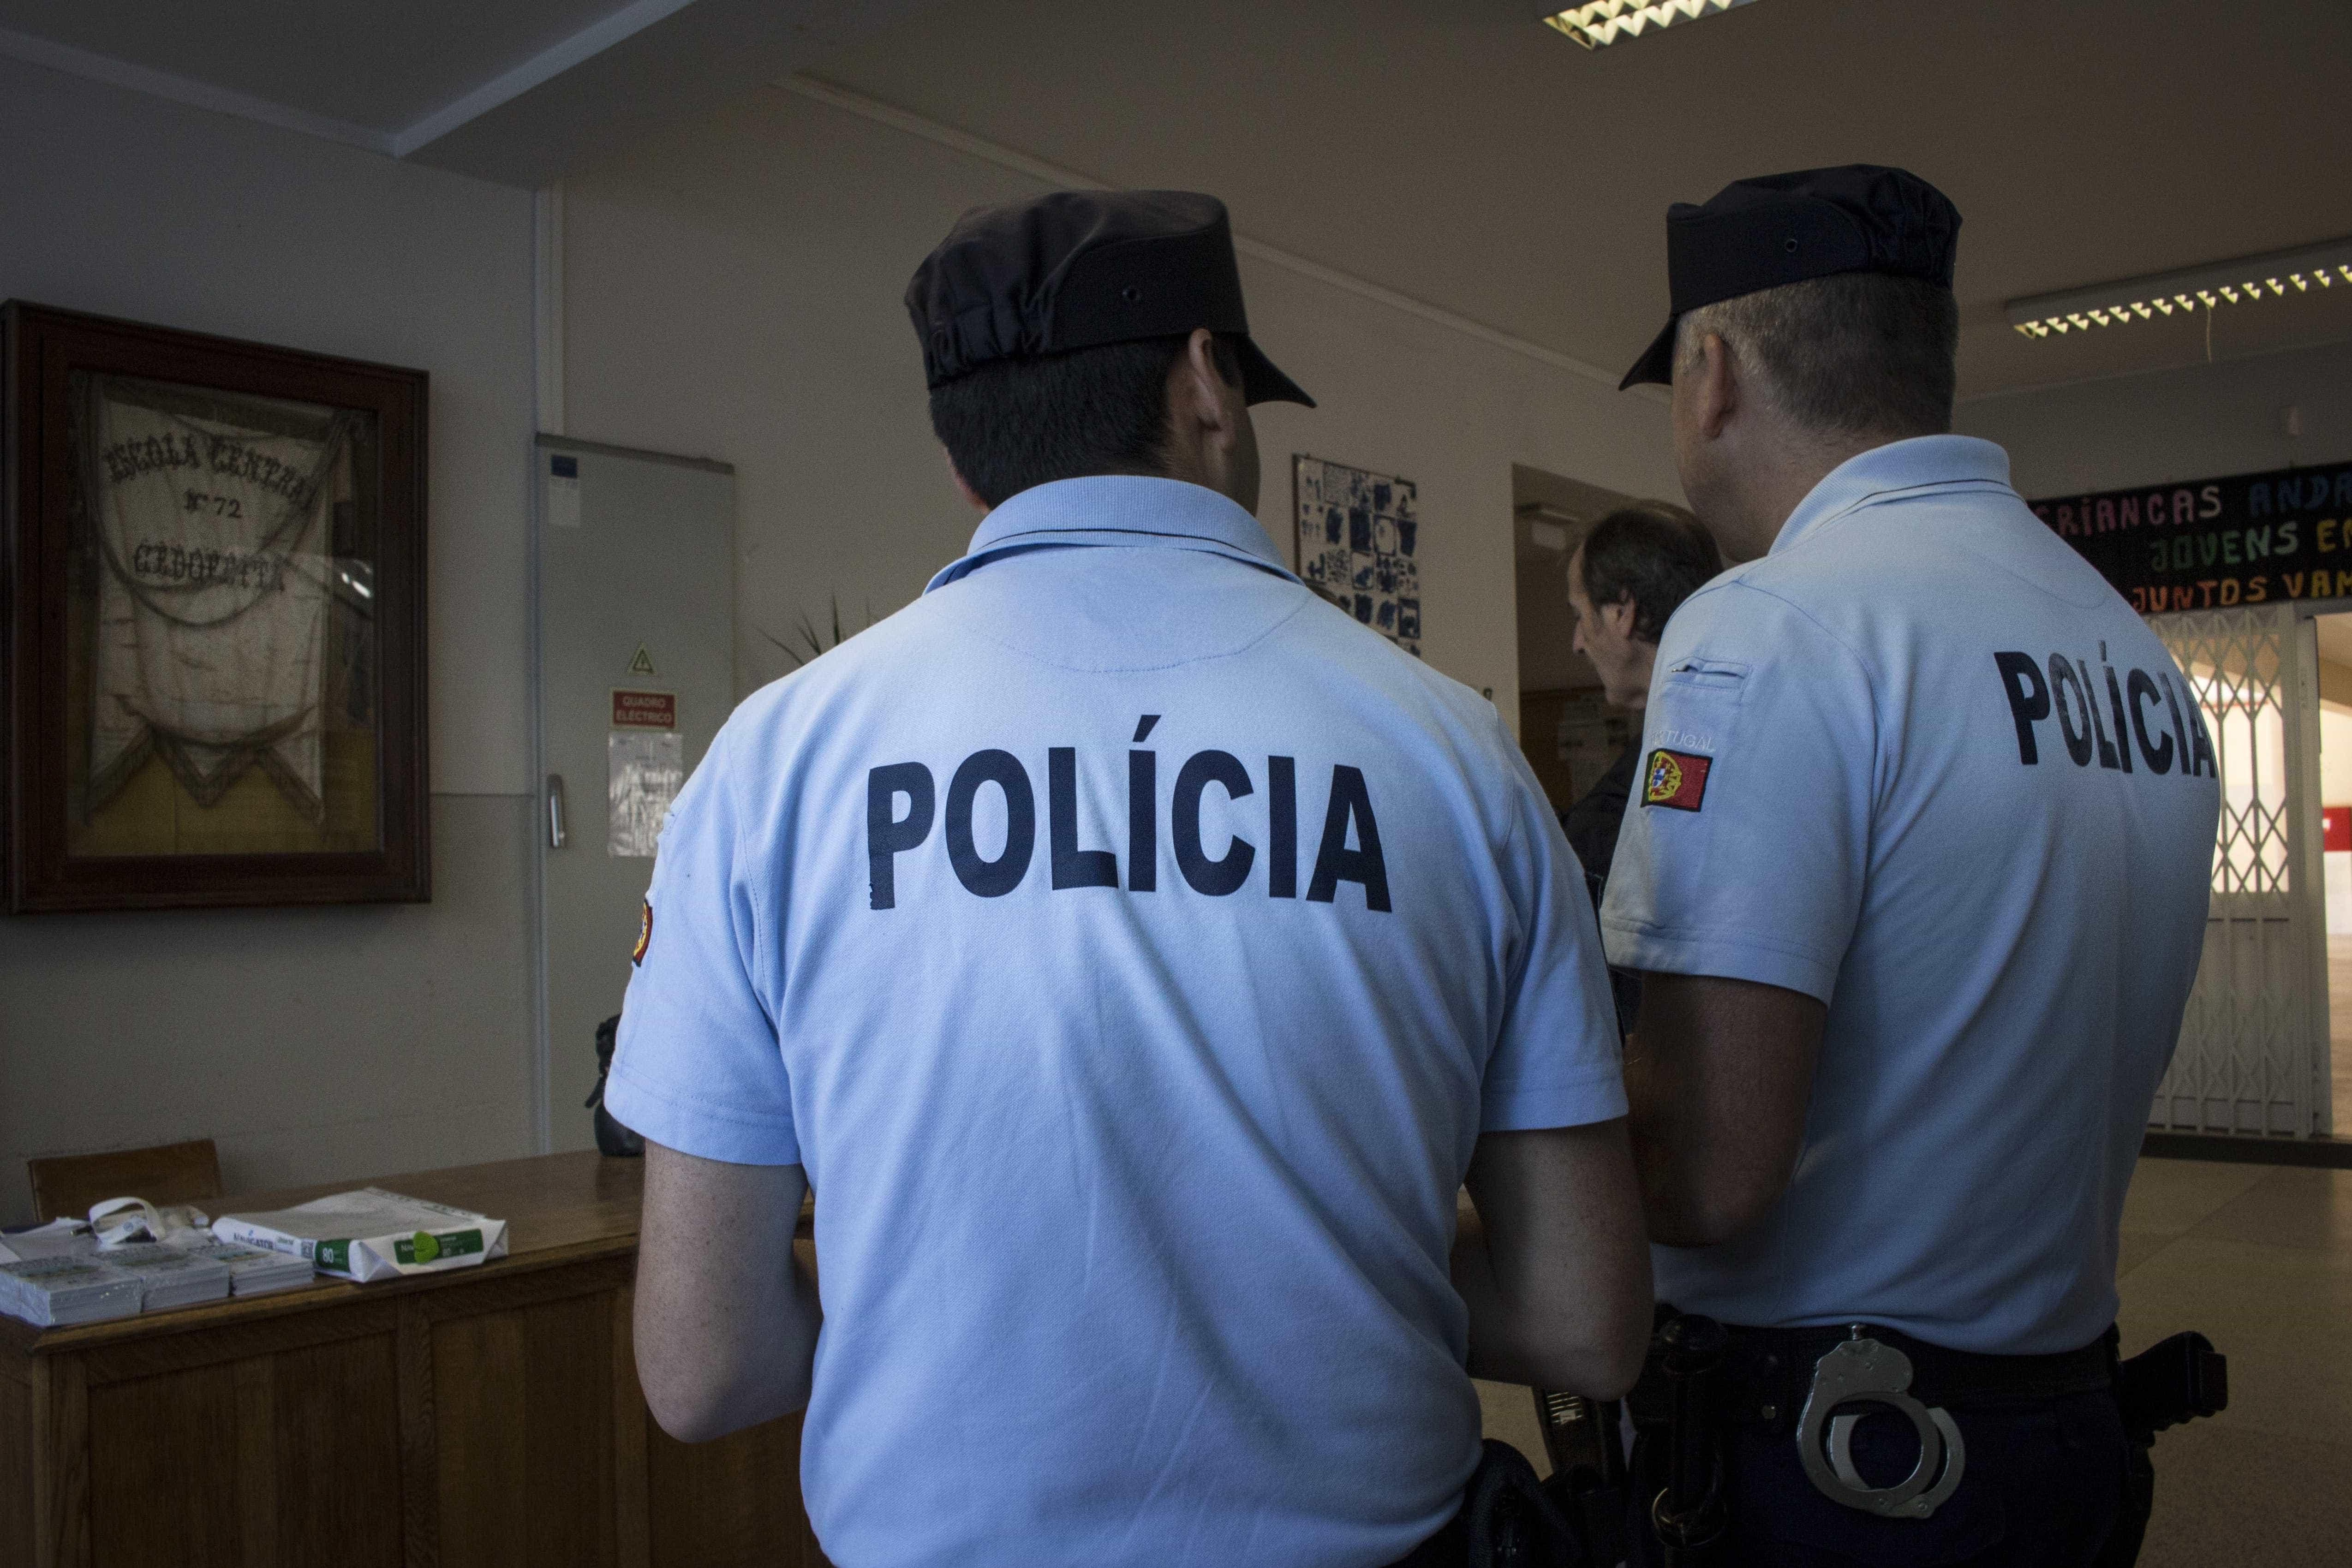 PSP desmantela grupo de traficantes. Apreendidas 39 mil doses de droga